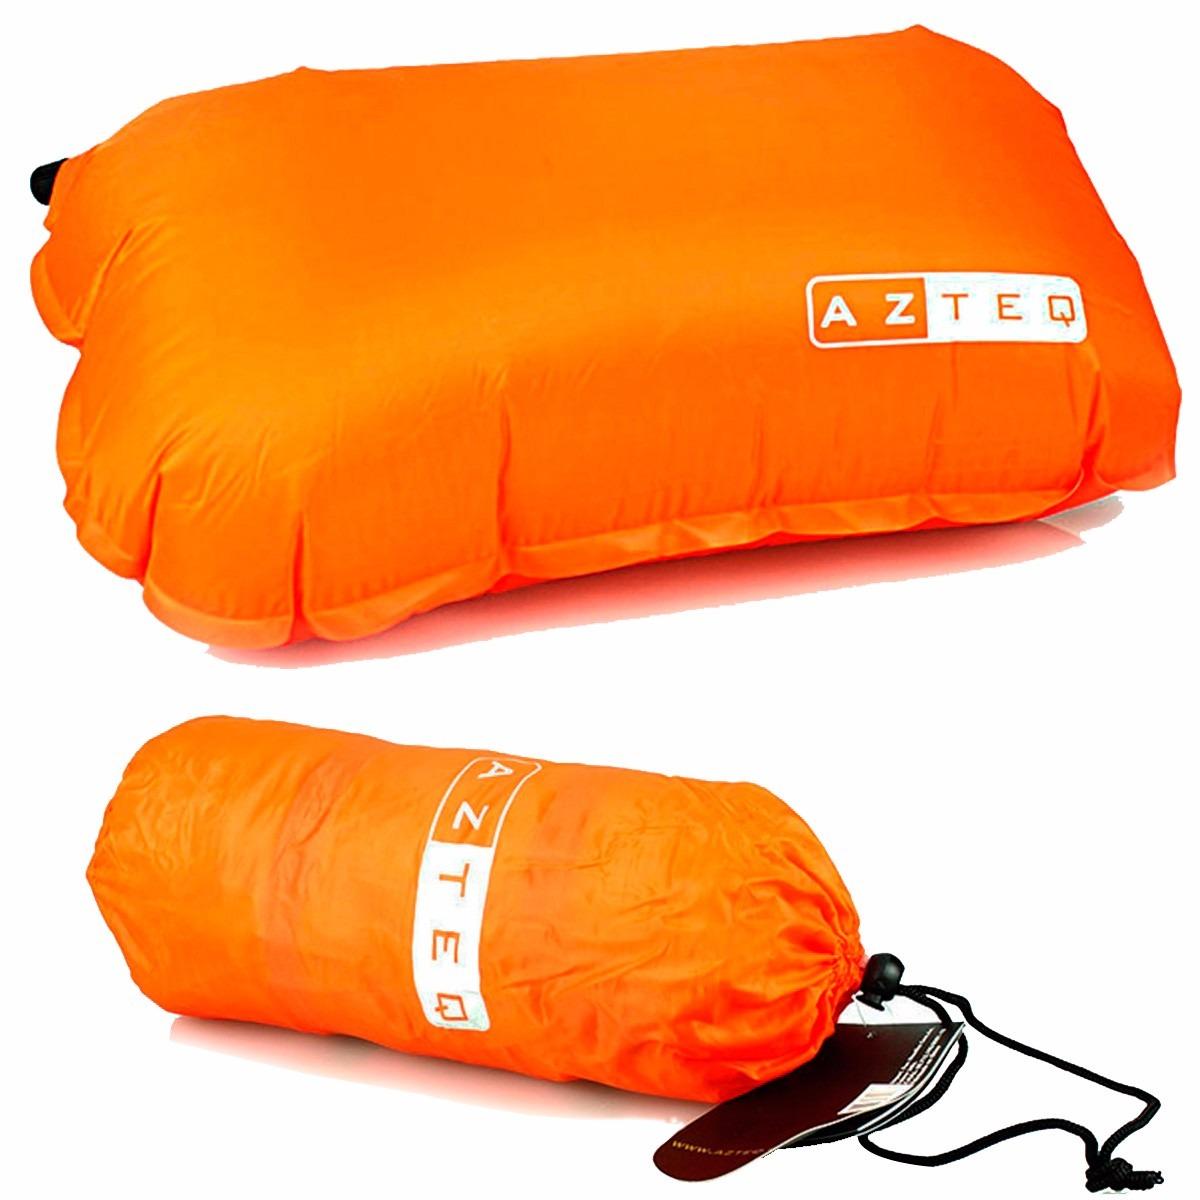 b615f4ce0 travesseiro auto inflável looper azteq isolante leve pratico. Carregando  zoom.